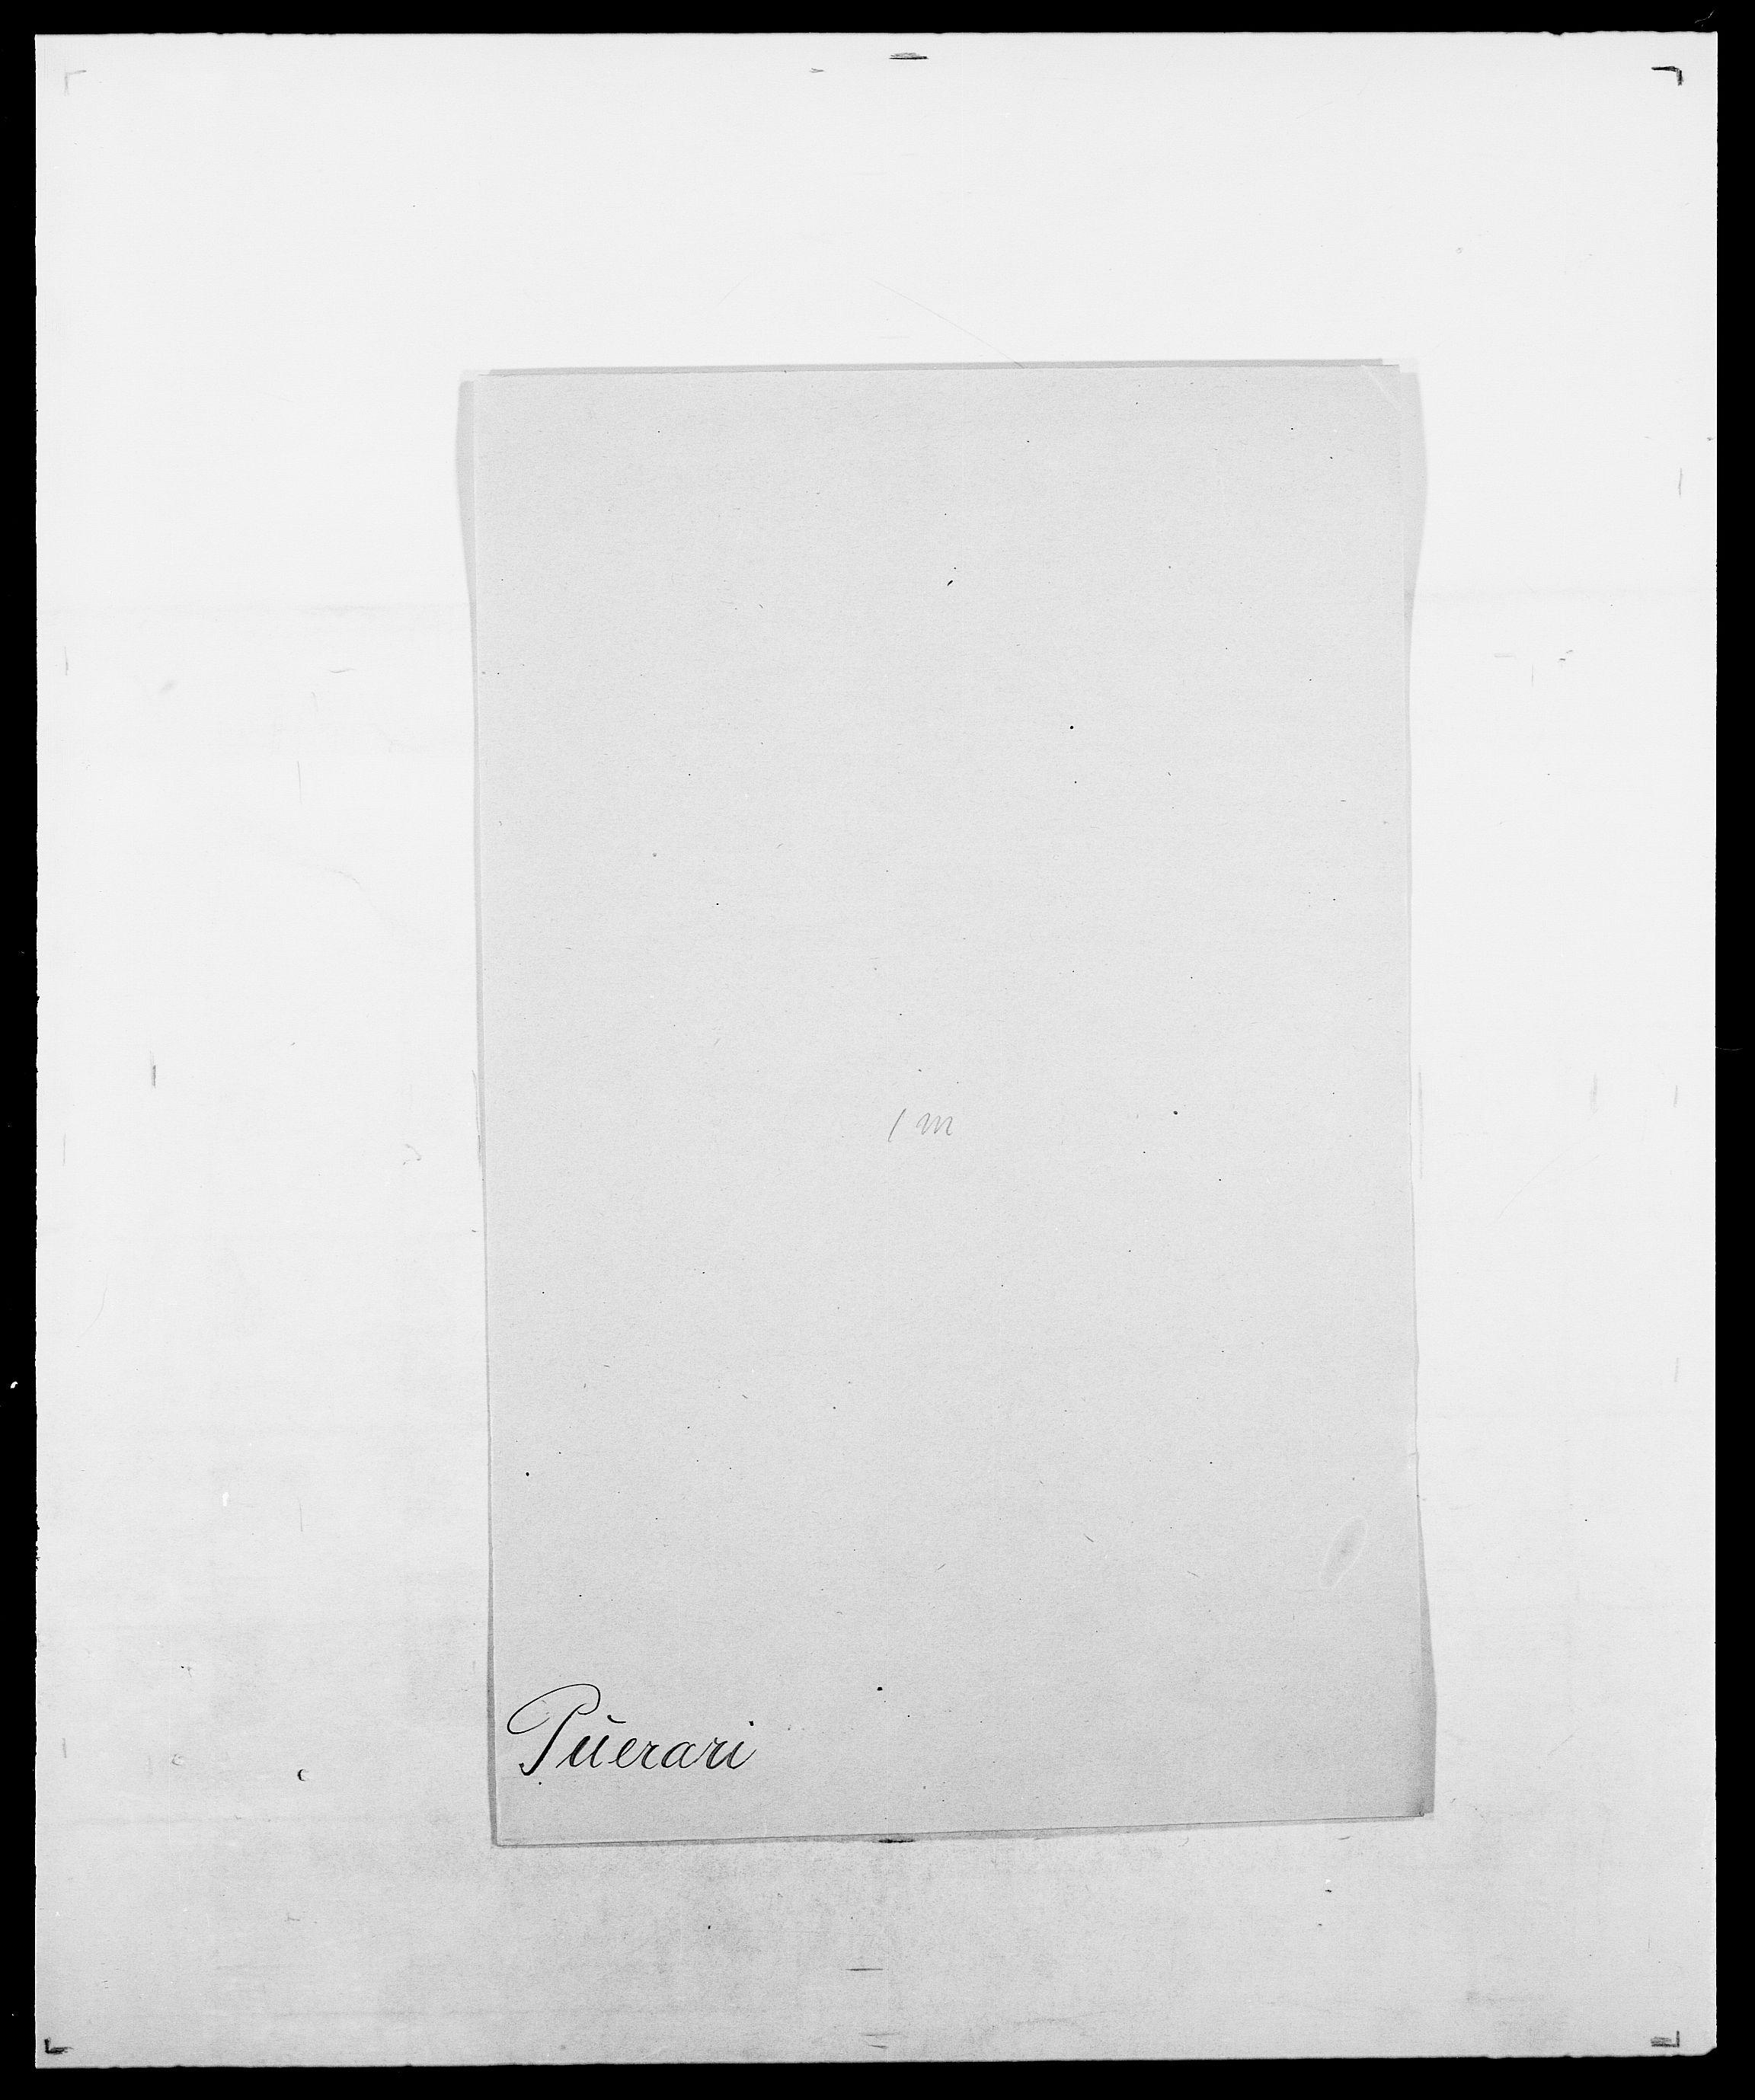 SAO, Delgobe, Charles Antoine - samling, D/Da/L0031: de Place - Raaum, s. 430